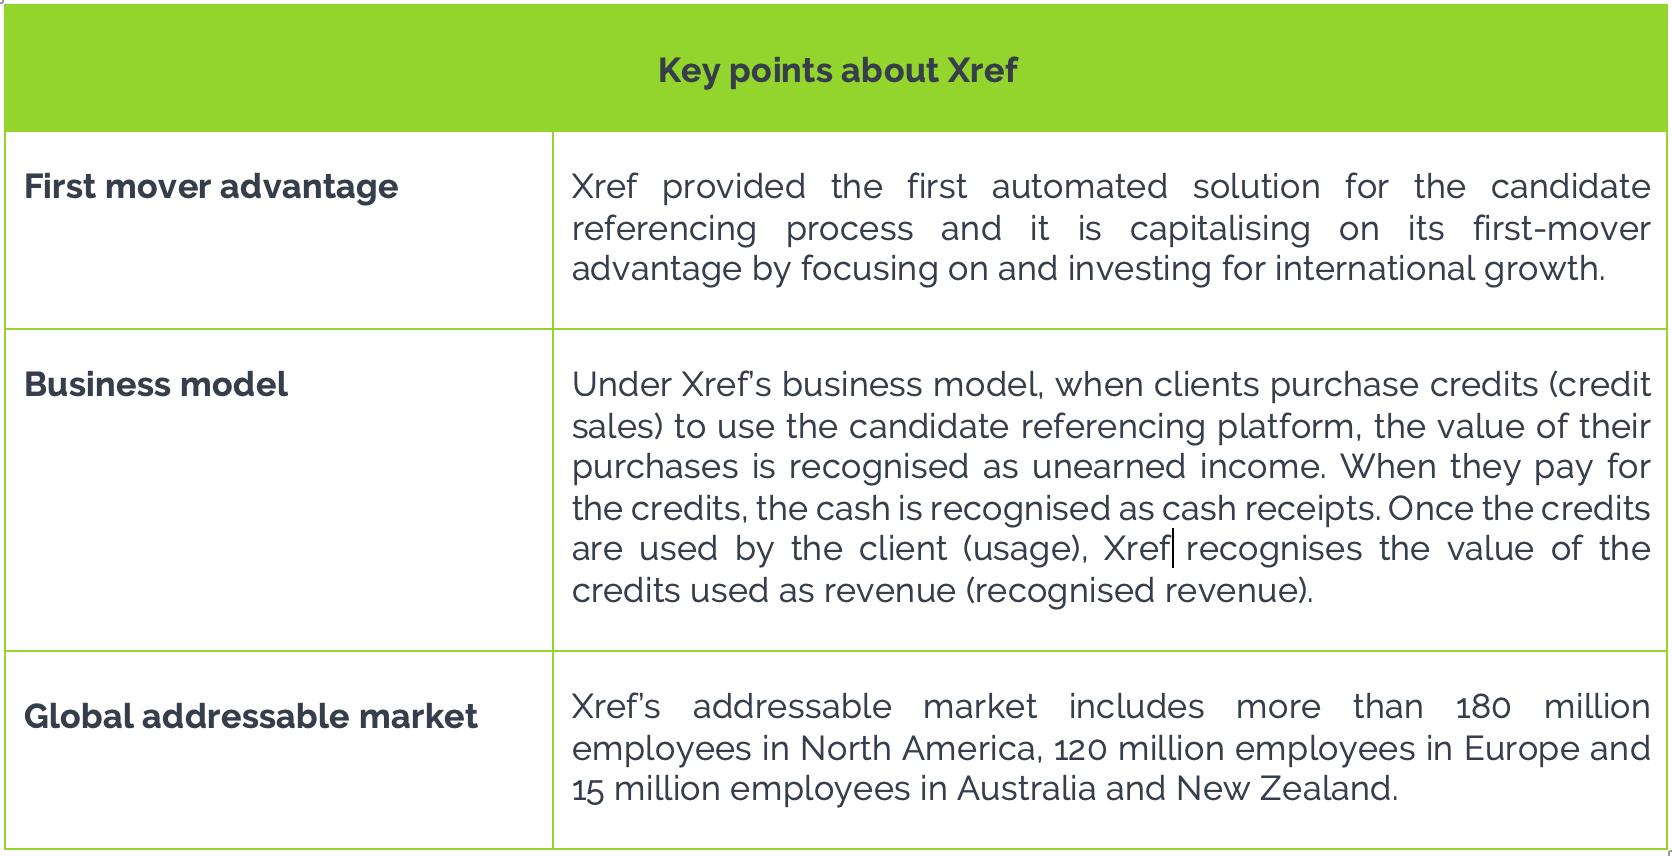 Key points table